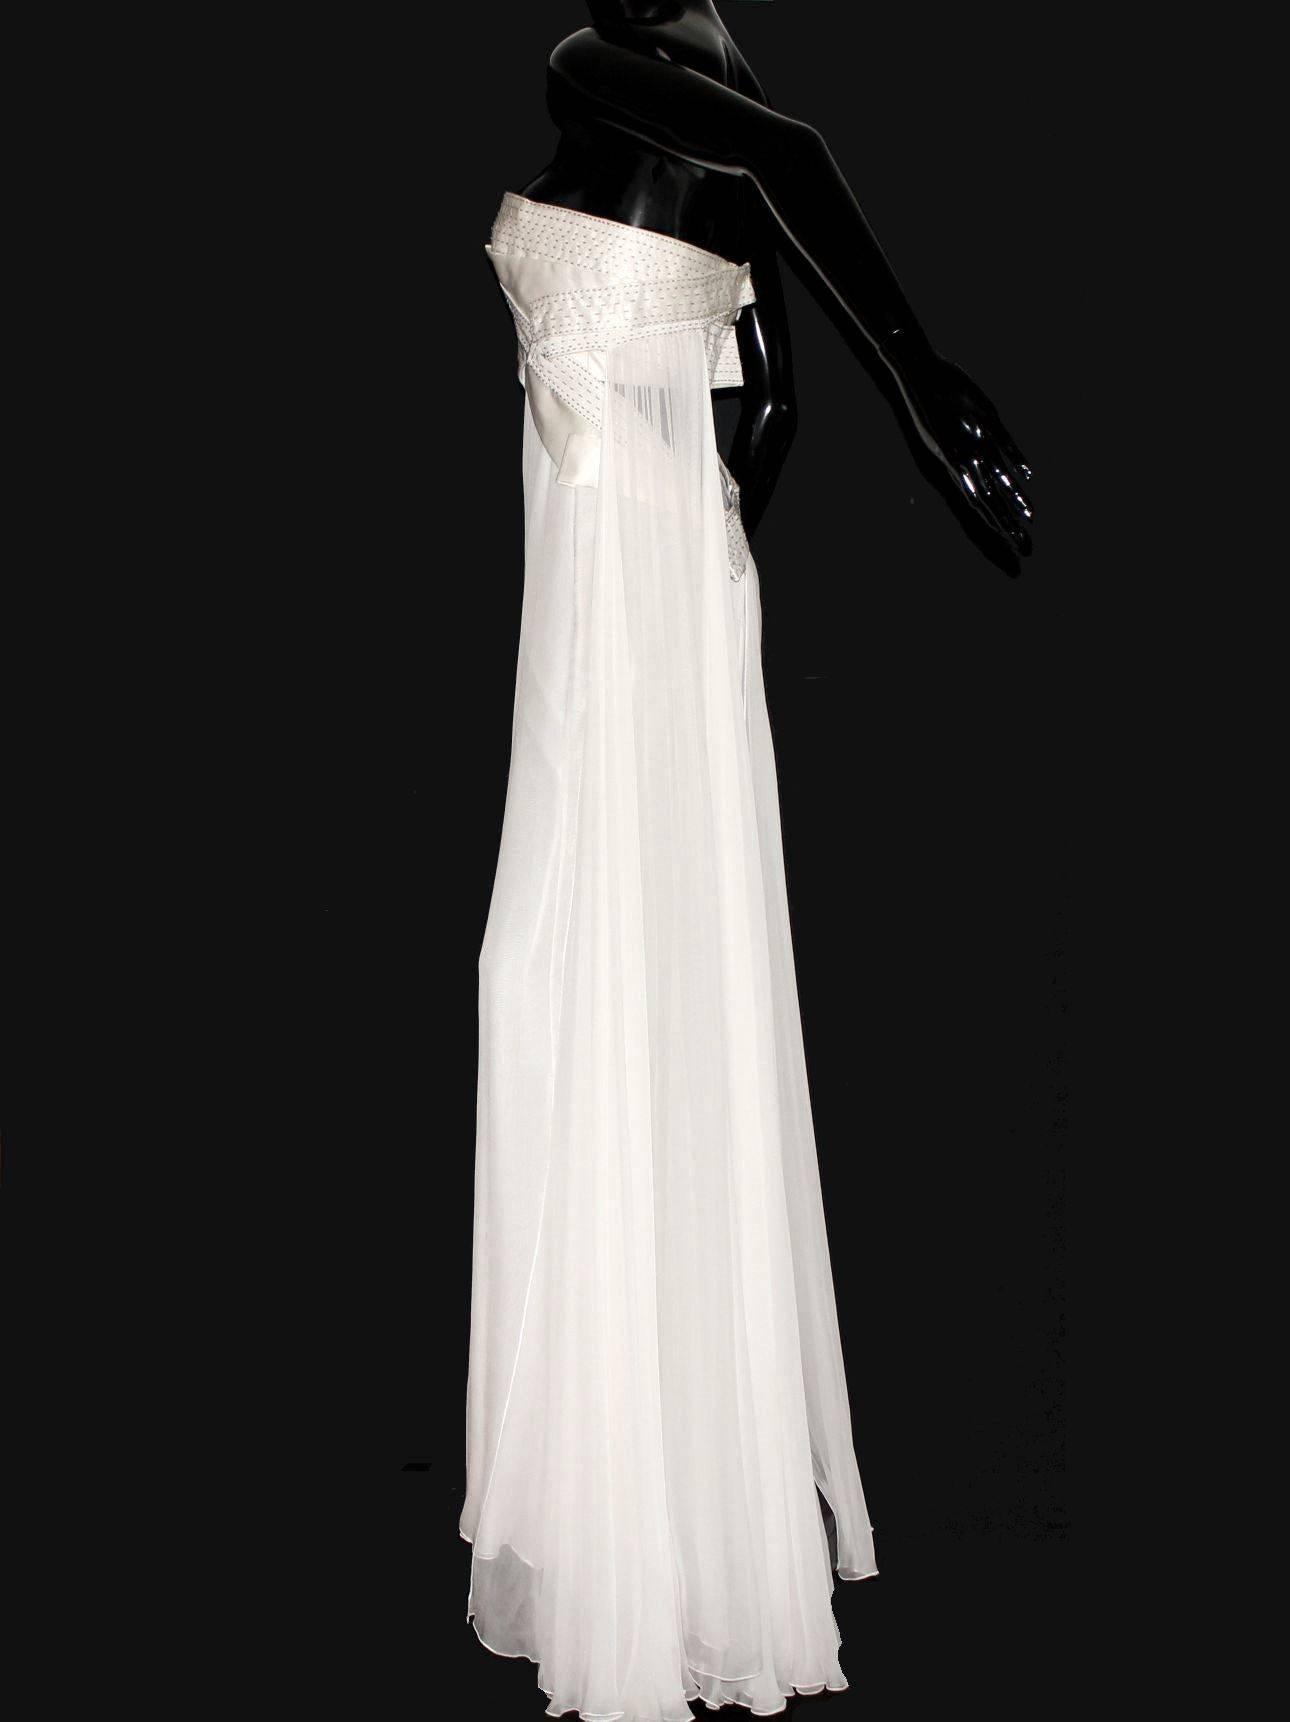 Evening Wedding Dresses for Women